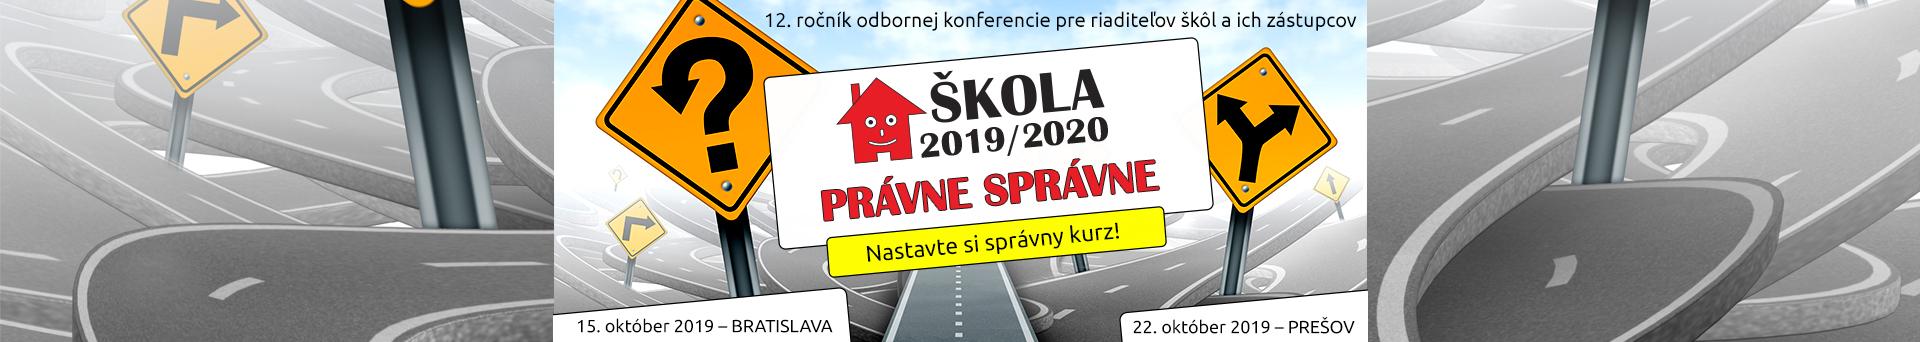 ŠKOLA 2019/2020